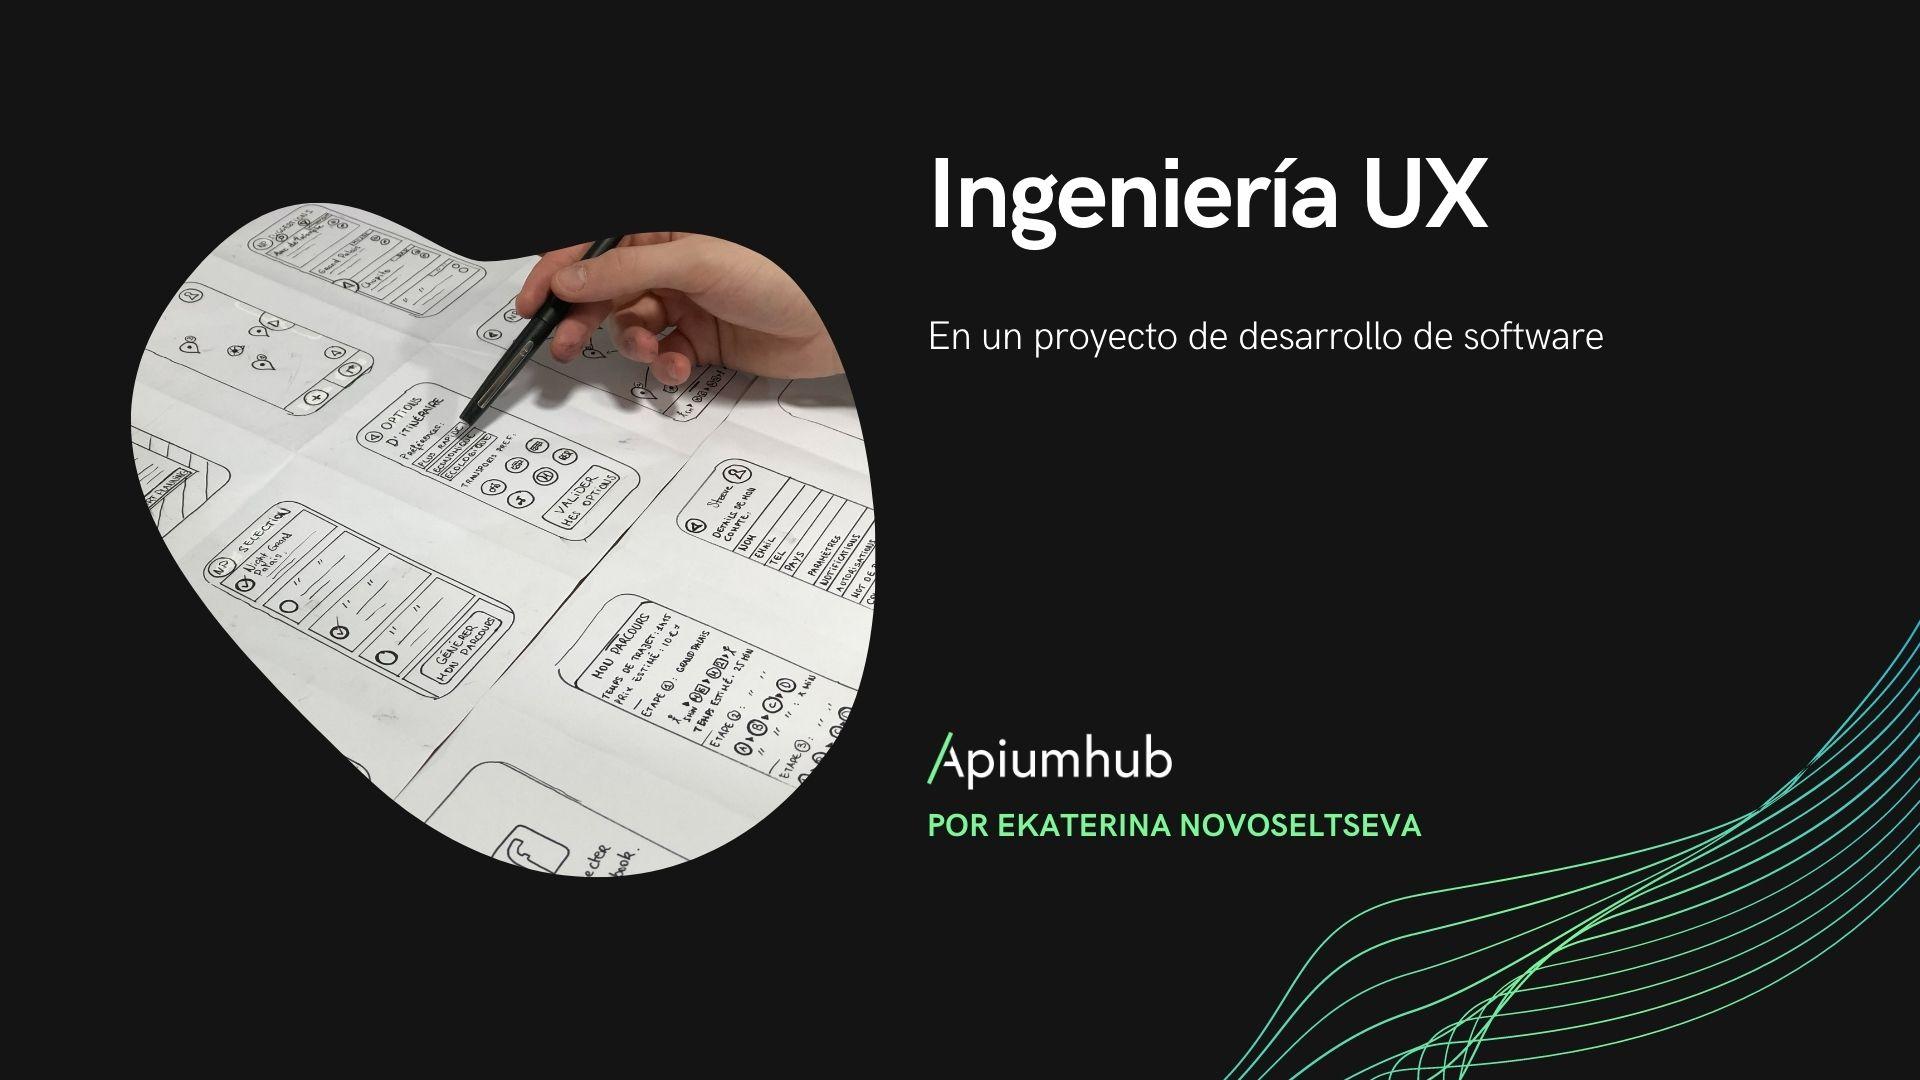 IngenieriaUX